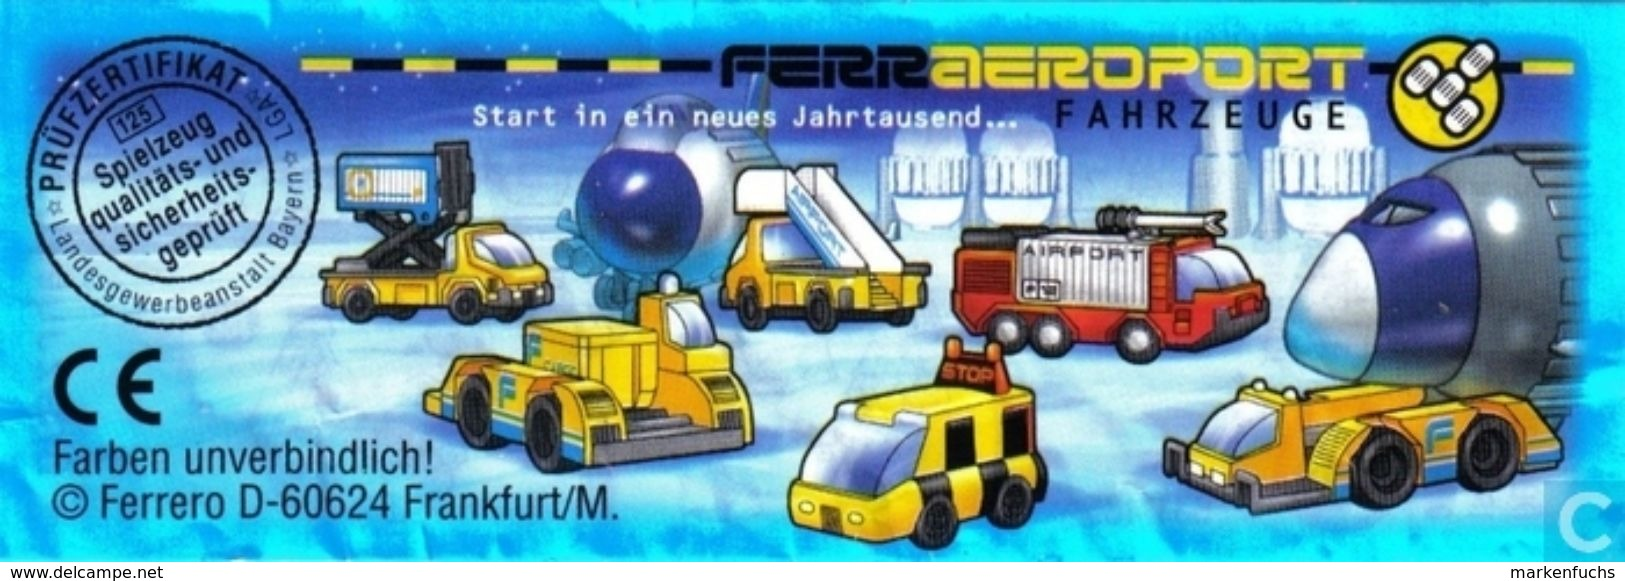 Ferraeroport Fahrzeuge 2000 / Hubcontainer + BPZ - Ü-Ei